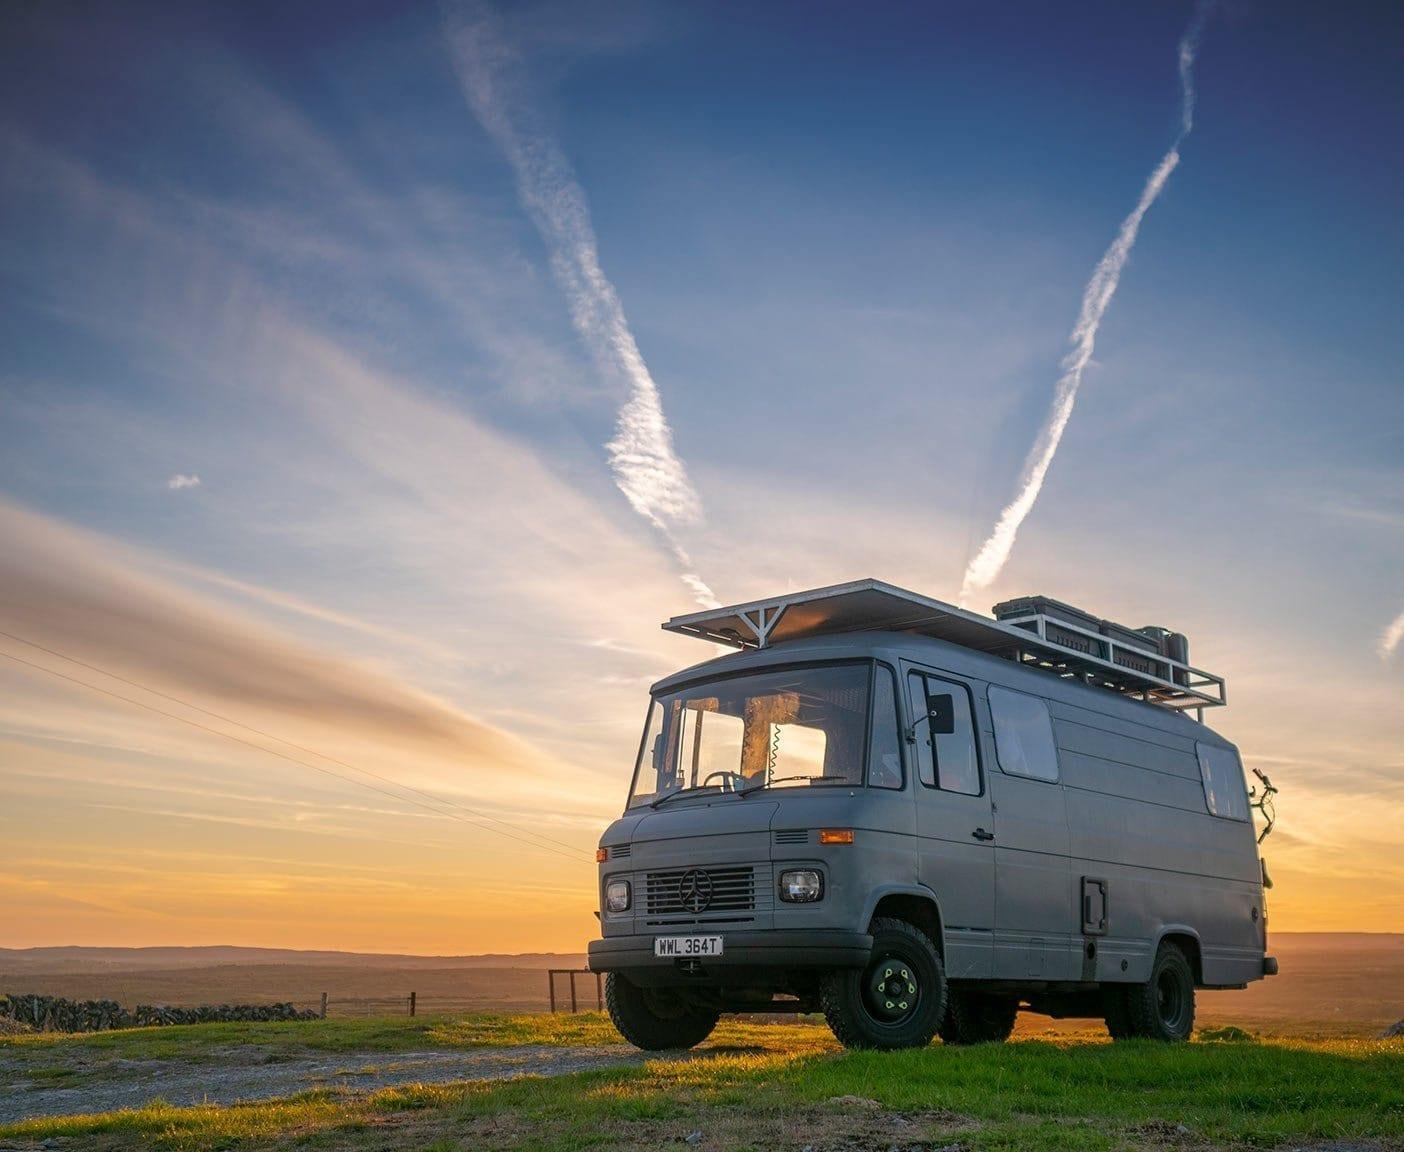 rolly-sonnenuntergang-mercedes-508d-camper-van-wohnmobil-krankenwagen